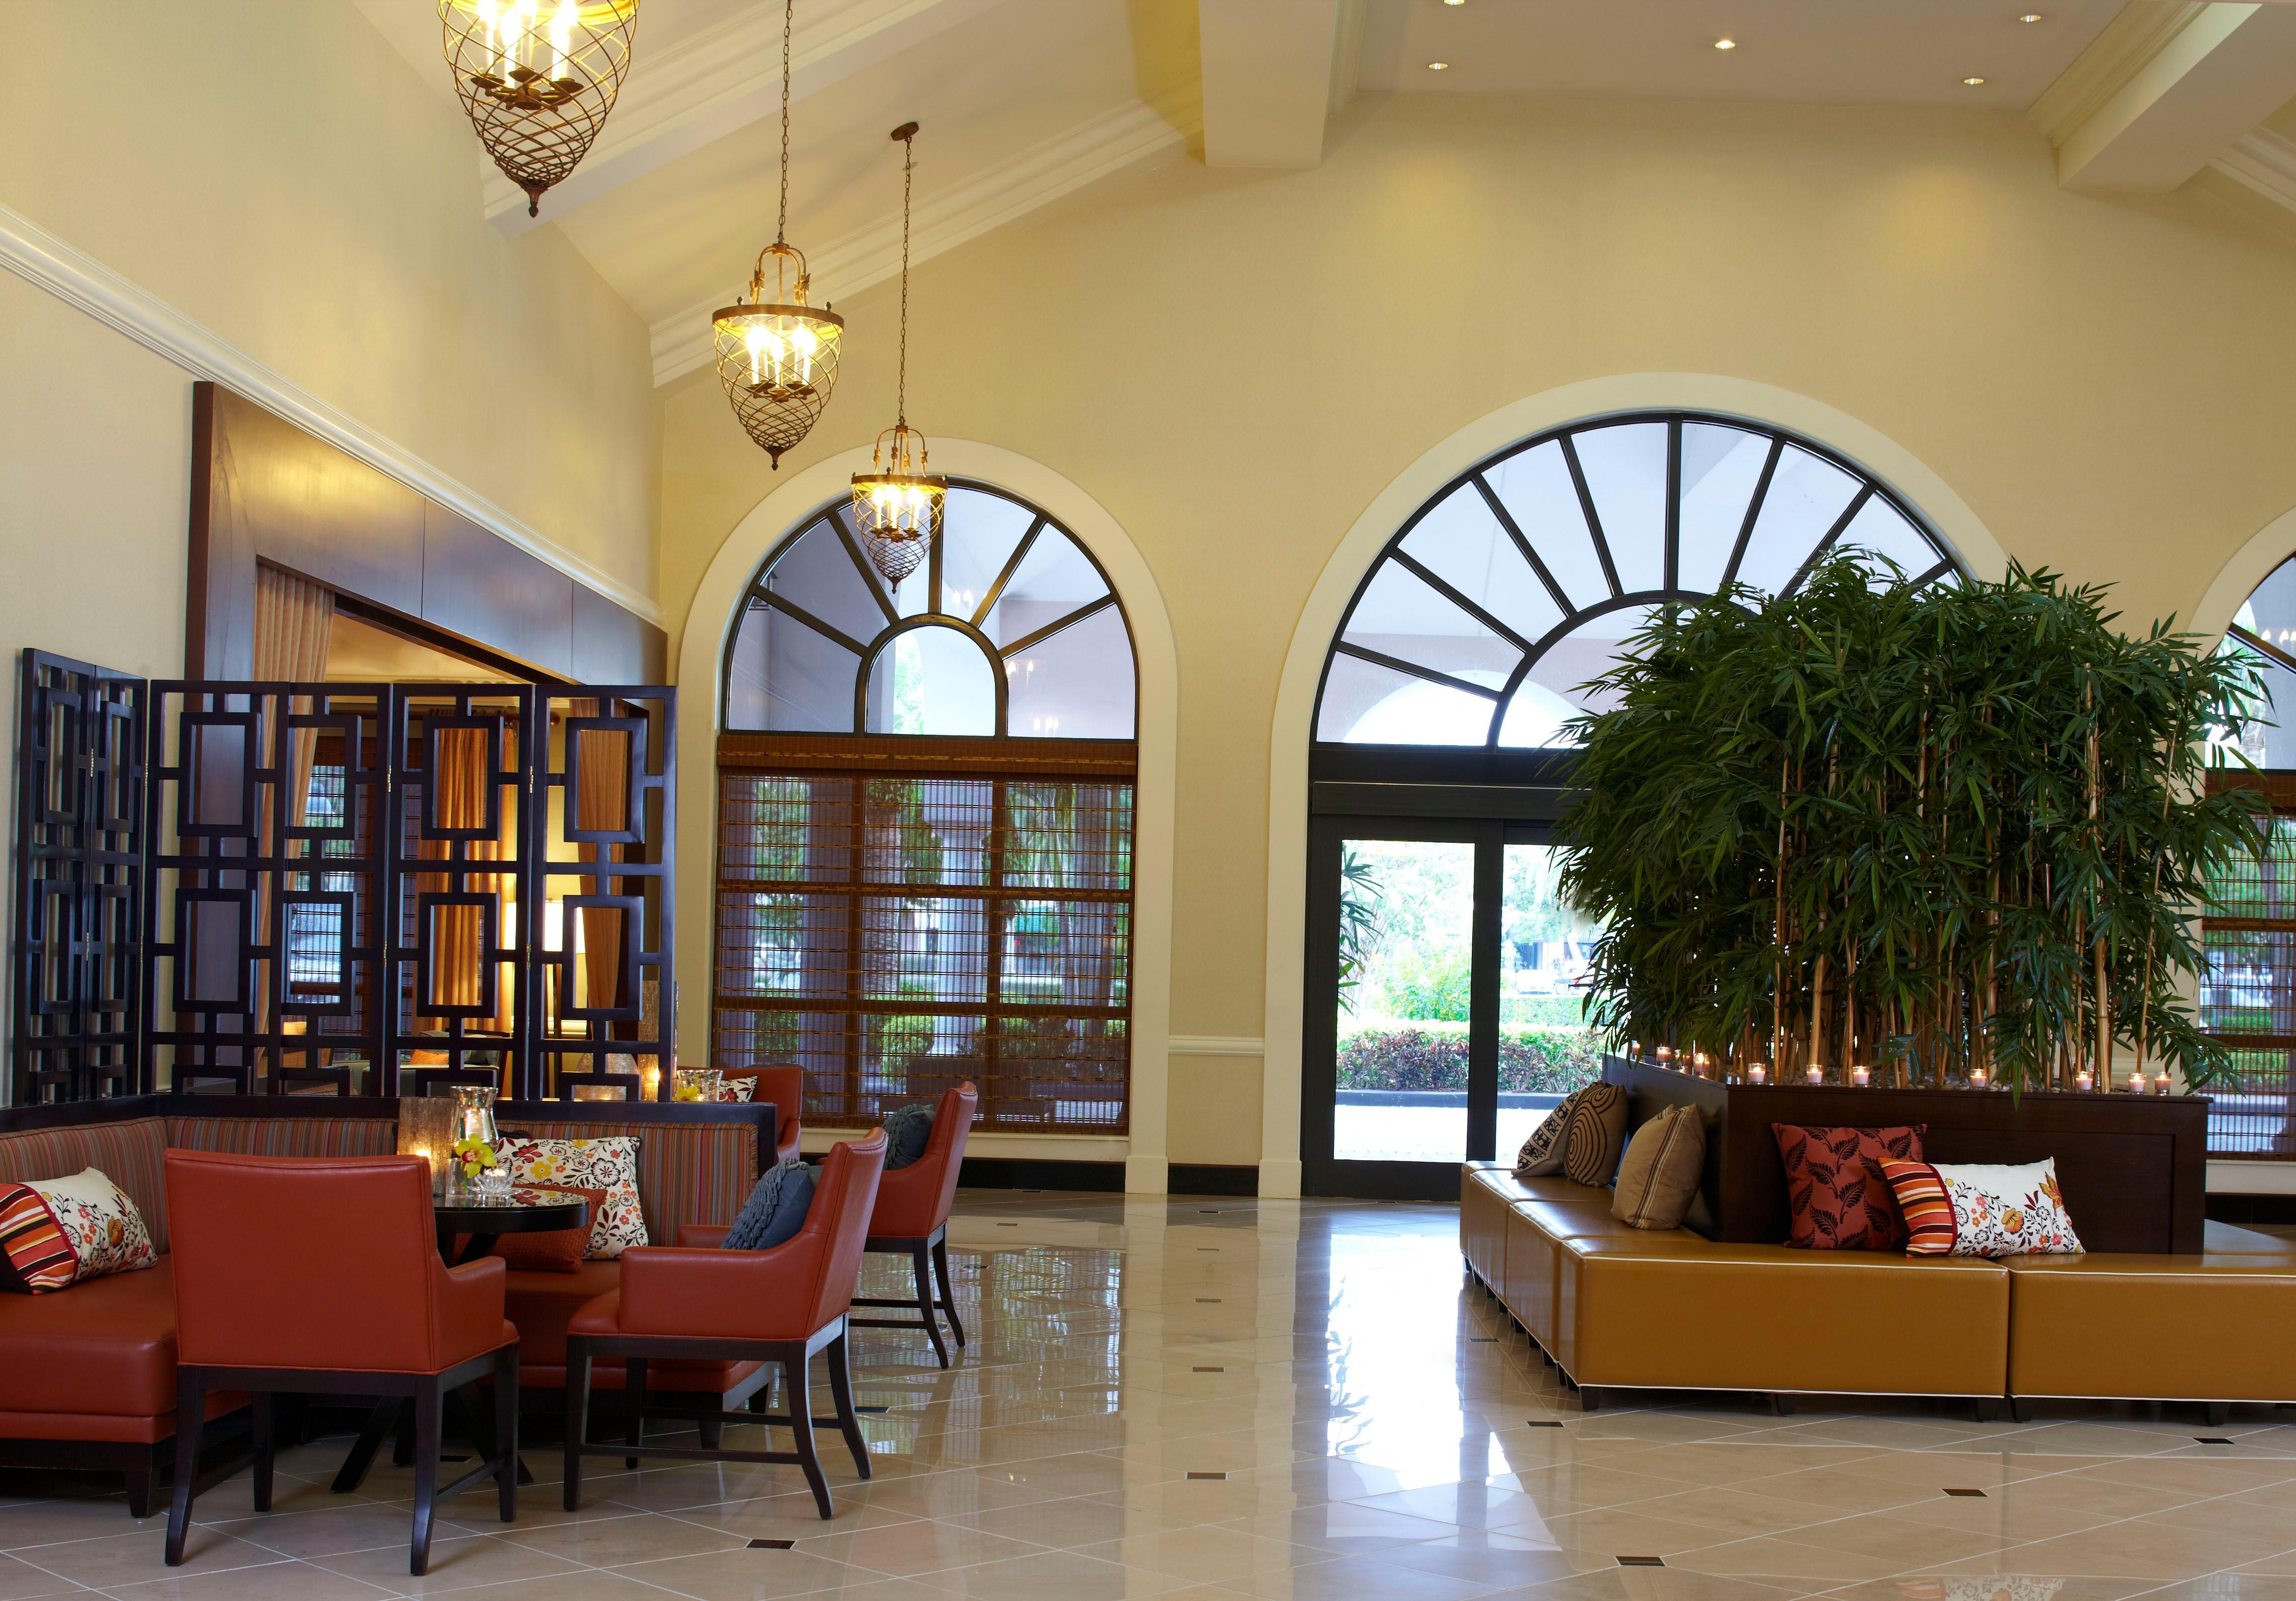 Renaissance Fort Lauderdale Cruise Port Hotel image 21